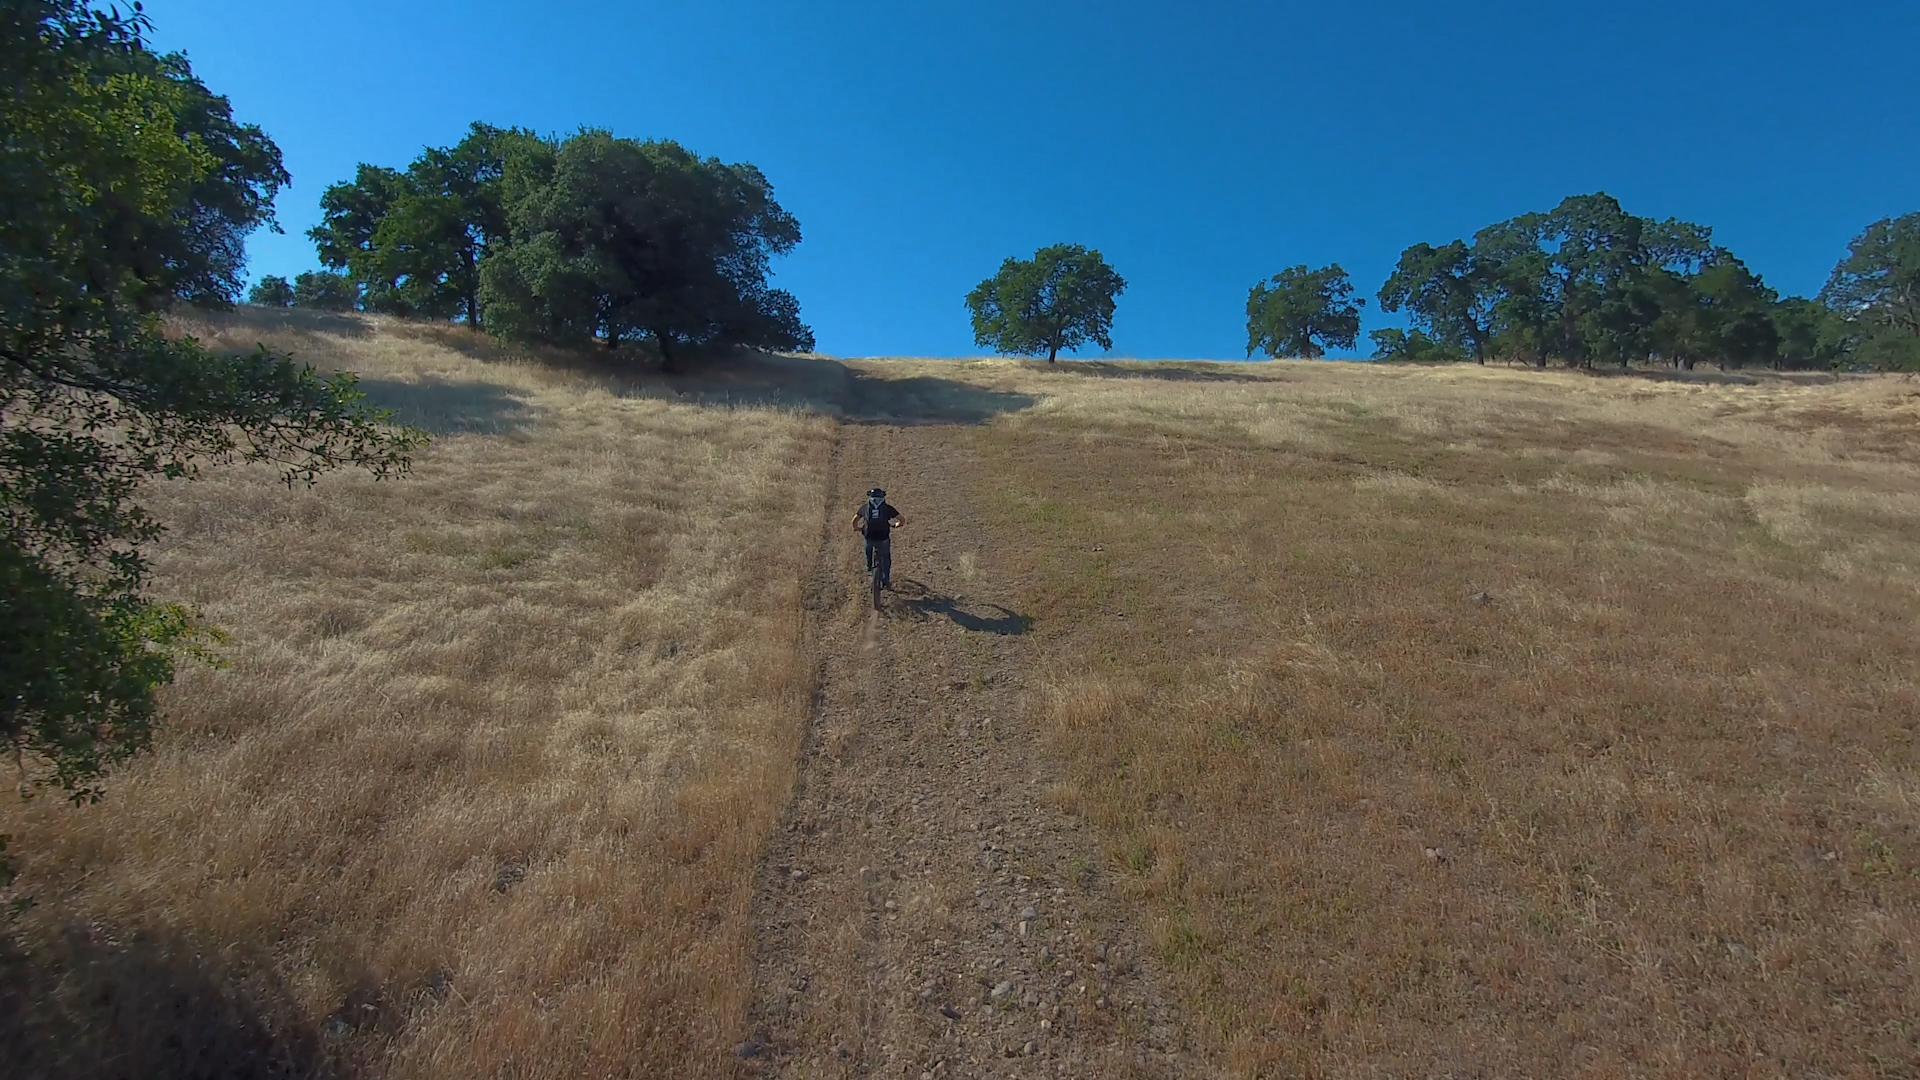 electrified-reviews-stealth-b52-bomber-electric-bike-review-hill-climb.jpg